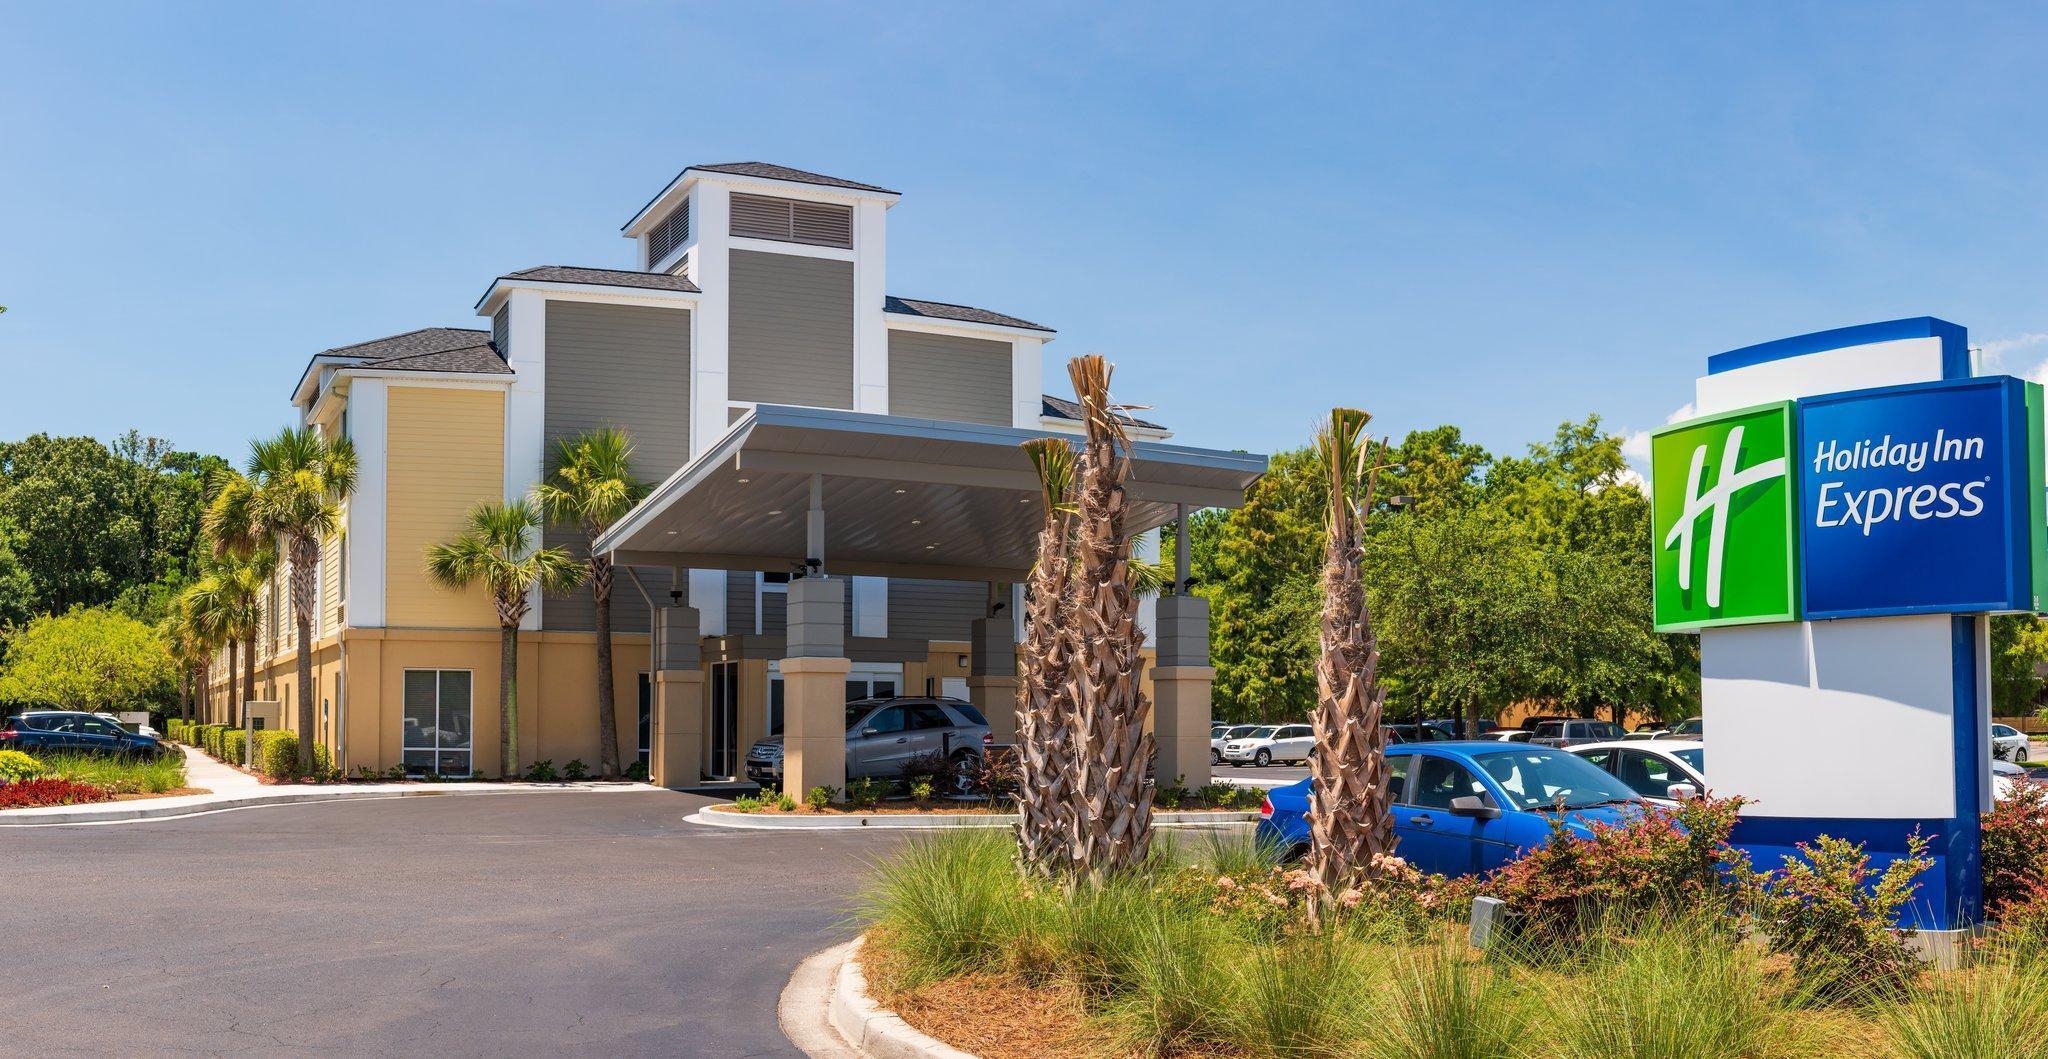 Holiday Inn Express Charleston US Highway 17 And I 526